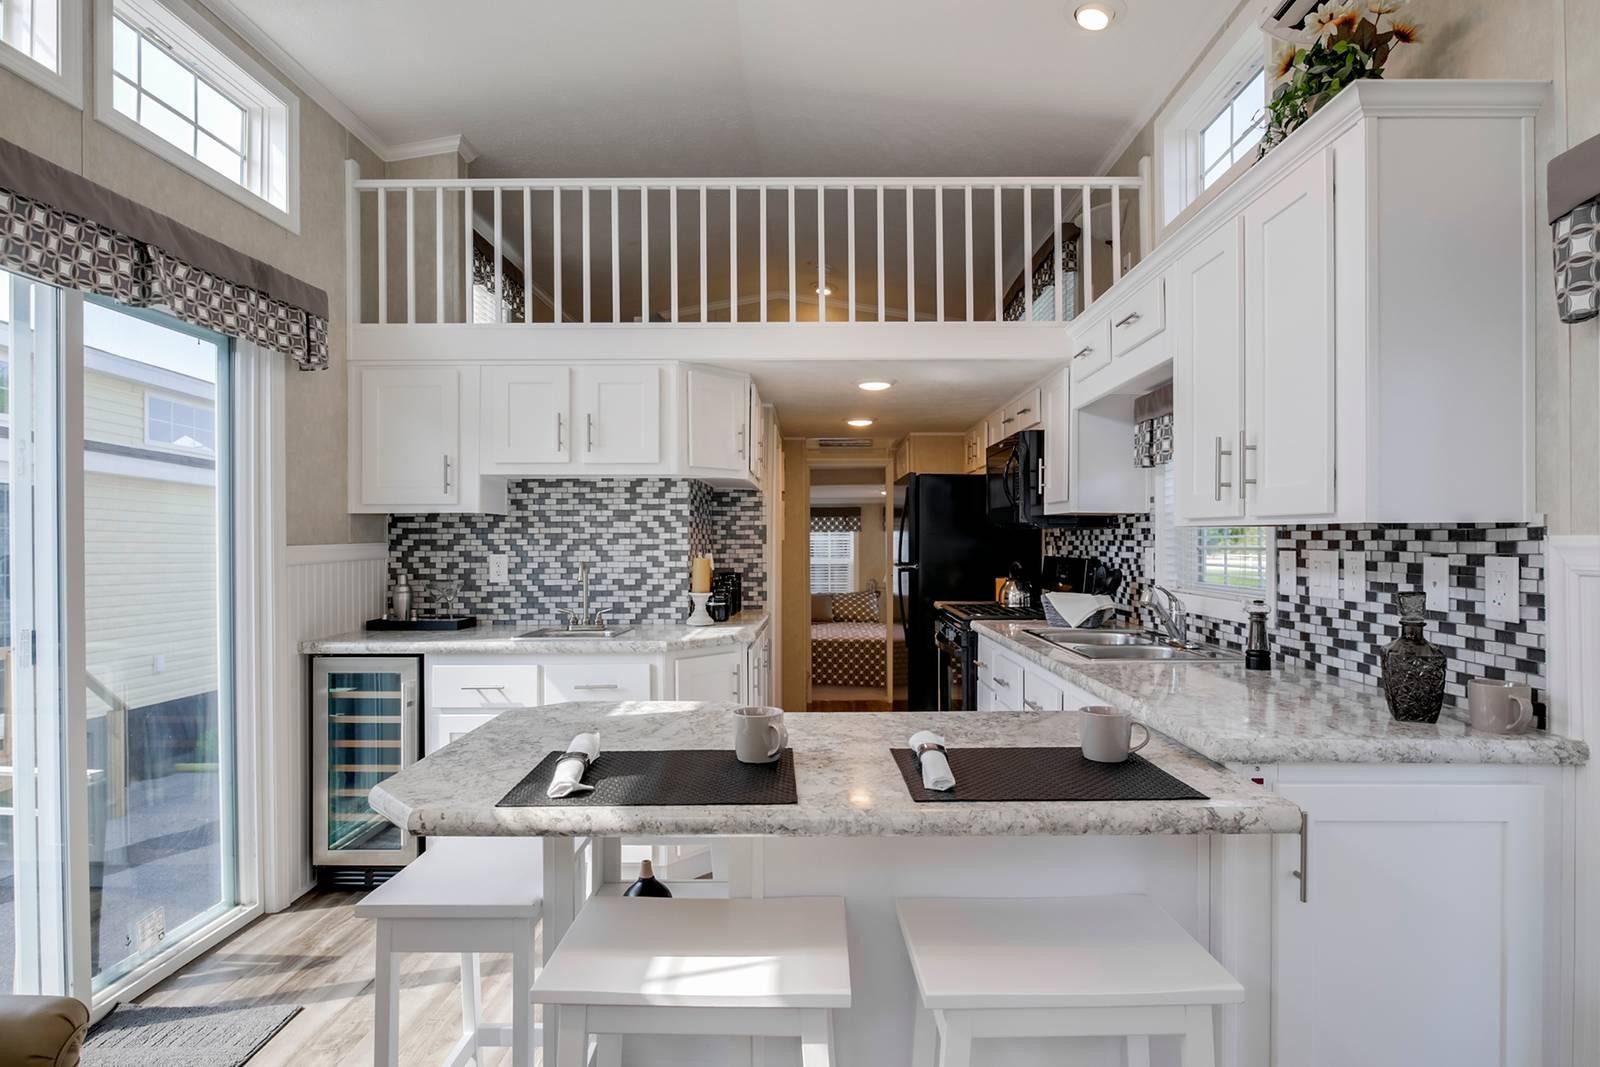 553L-kitchen-9-copy-1600x1067